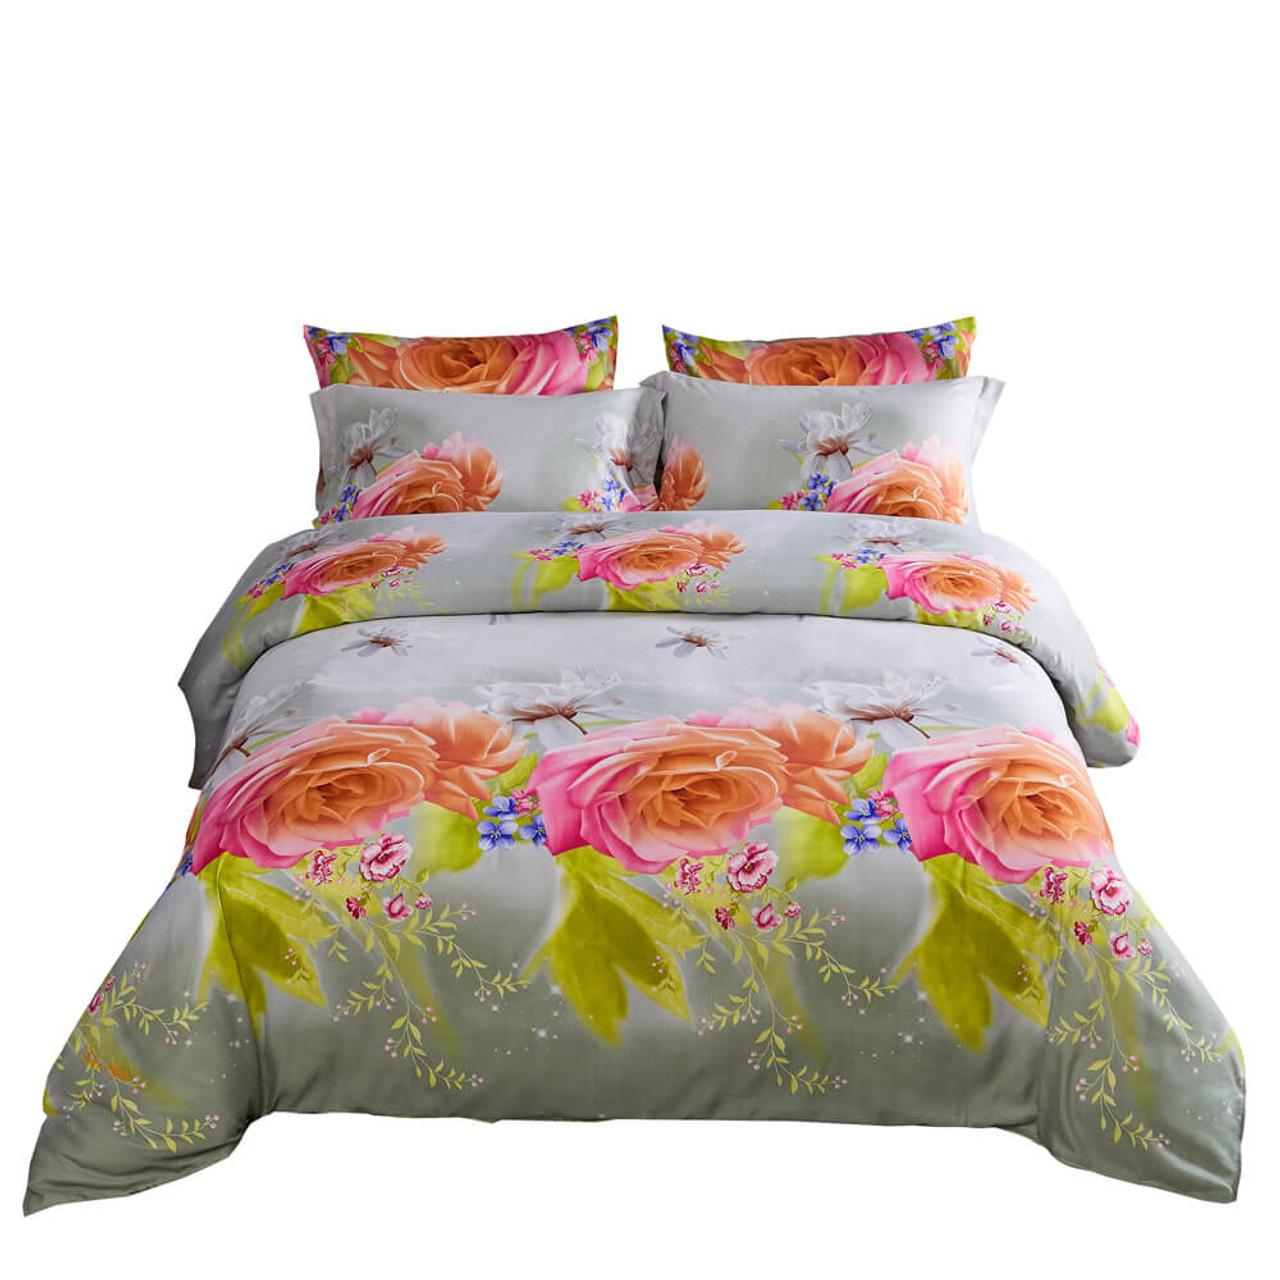 Drop-shipping Wholesale Floral Bedding Set DM723K